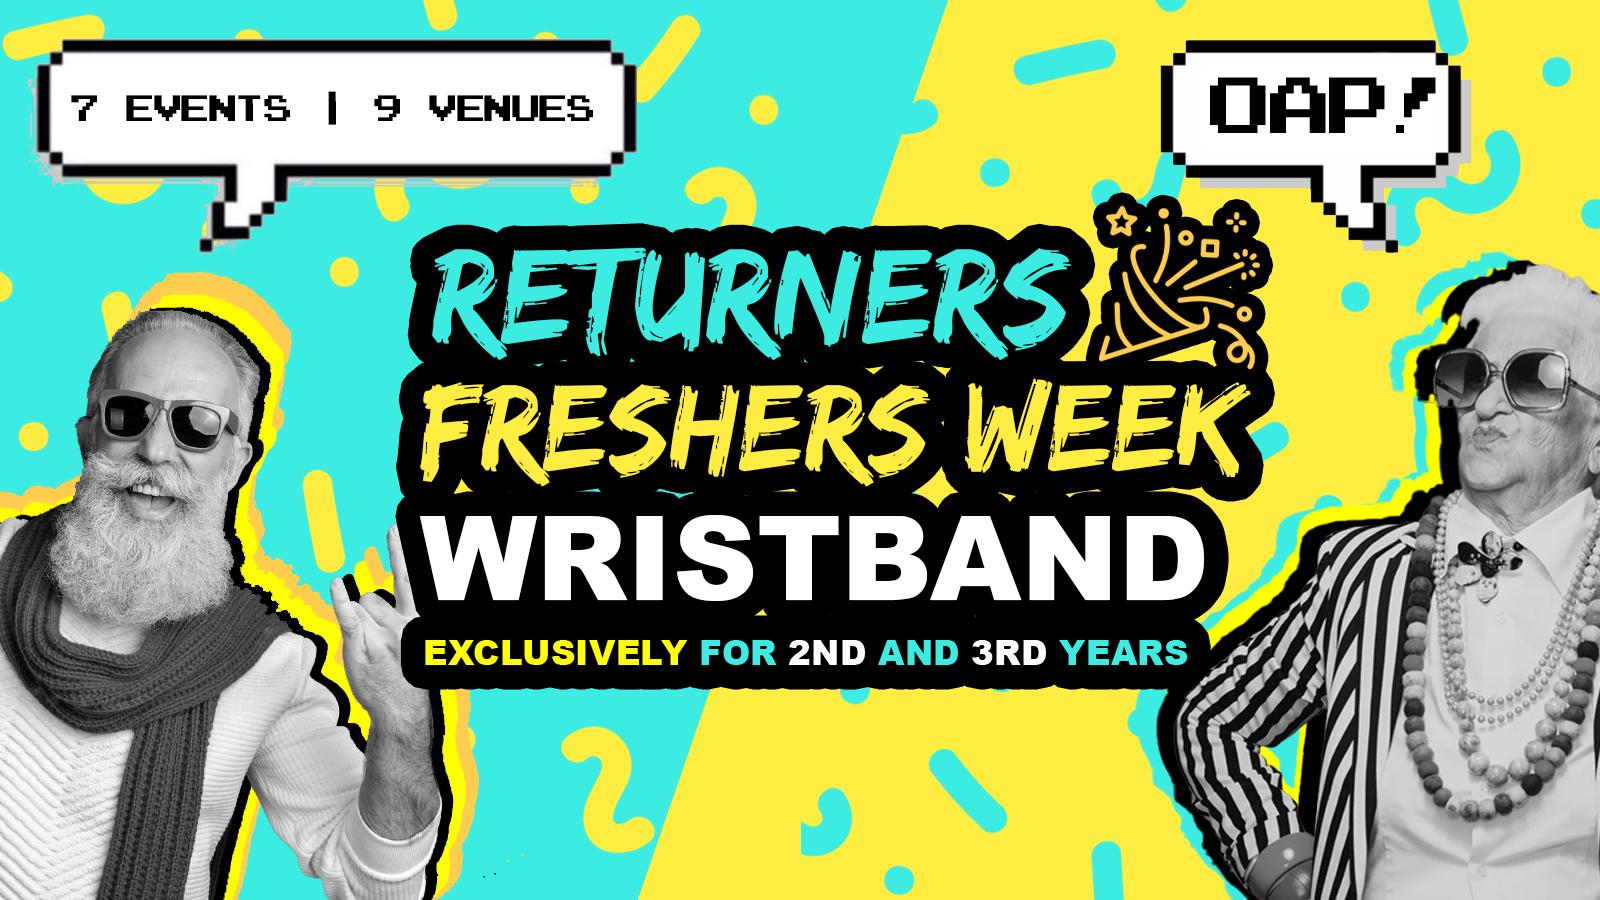 Leeds Returners Freshers Week Wristband 2021 | Exclusive for 2nd Years & 3rd Years